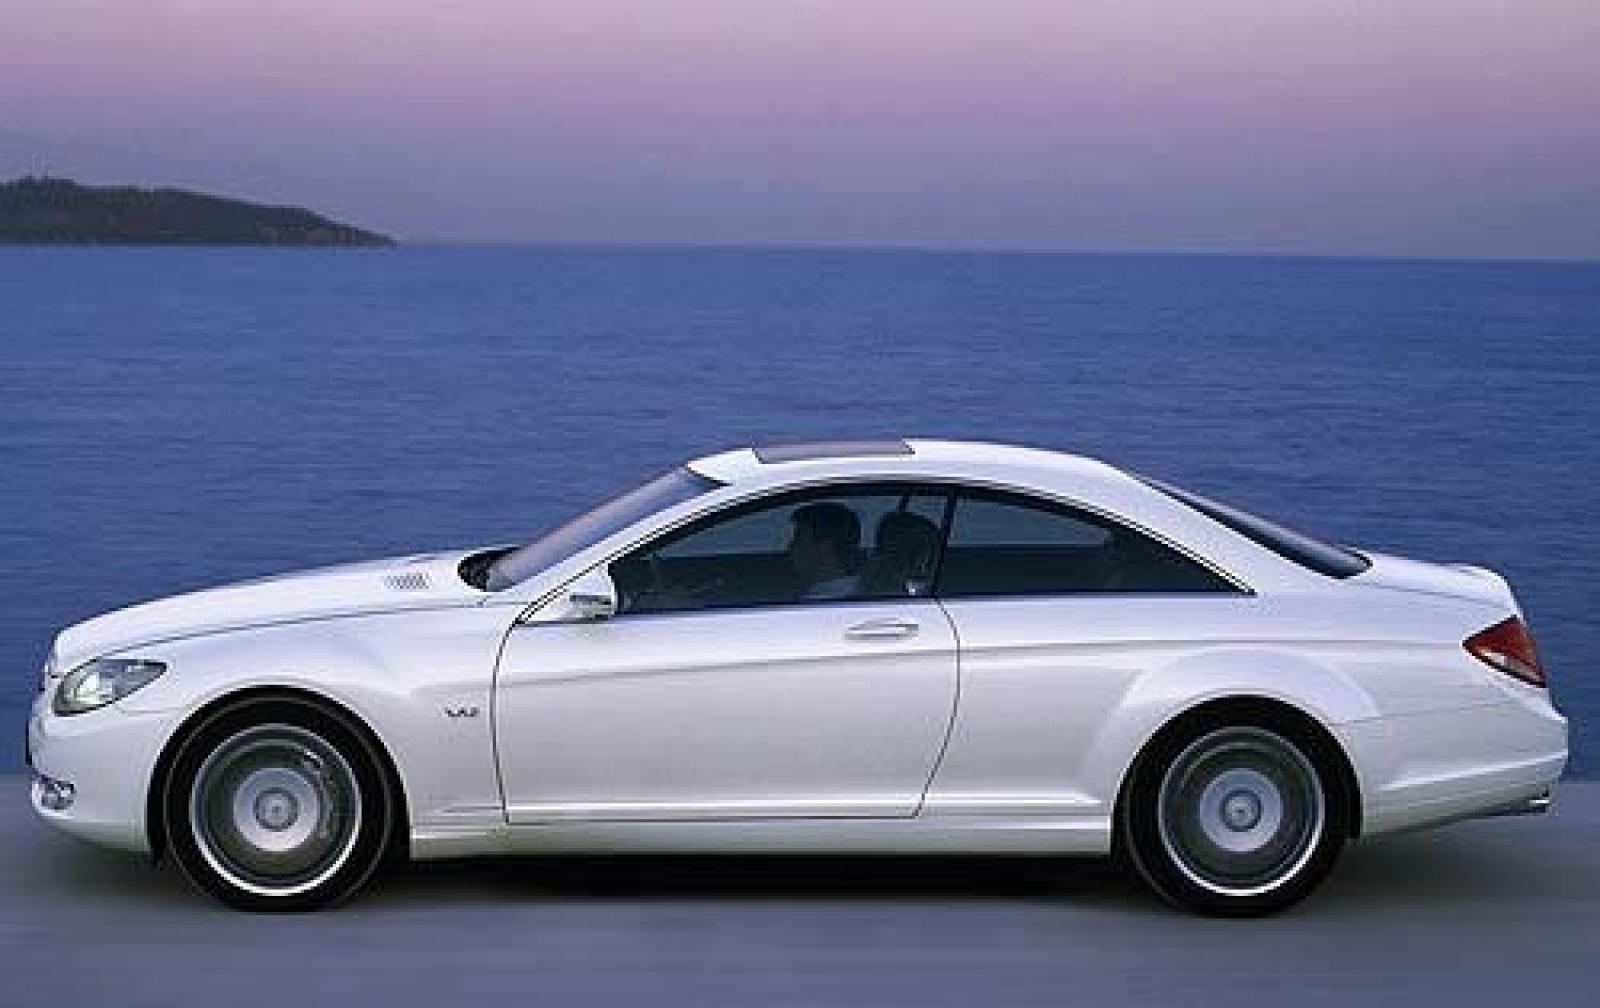 2009 mercedes benz cl class information and photos for Mercedes benz cl class